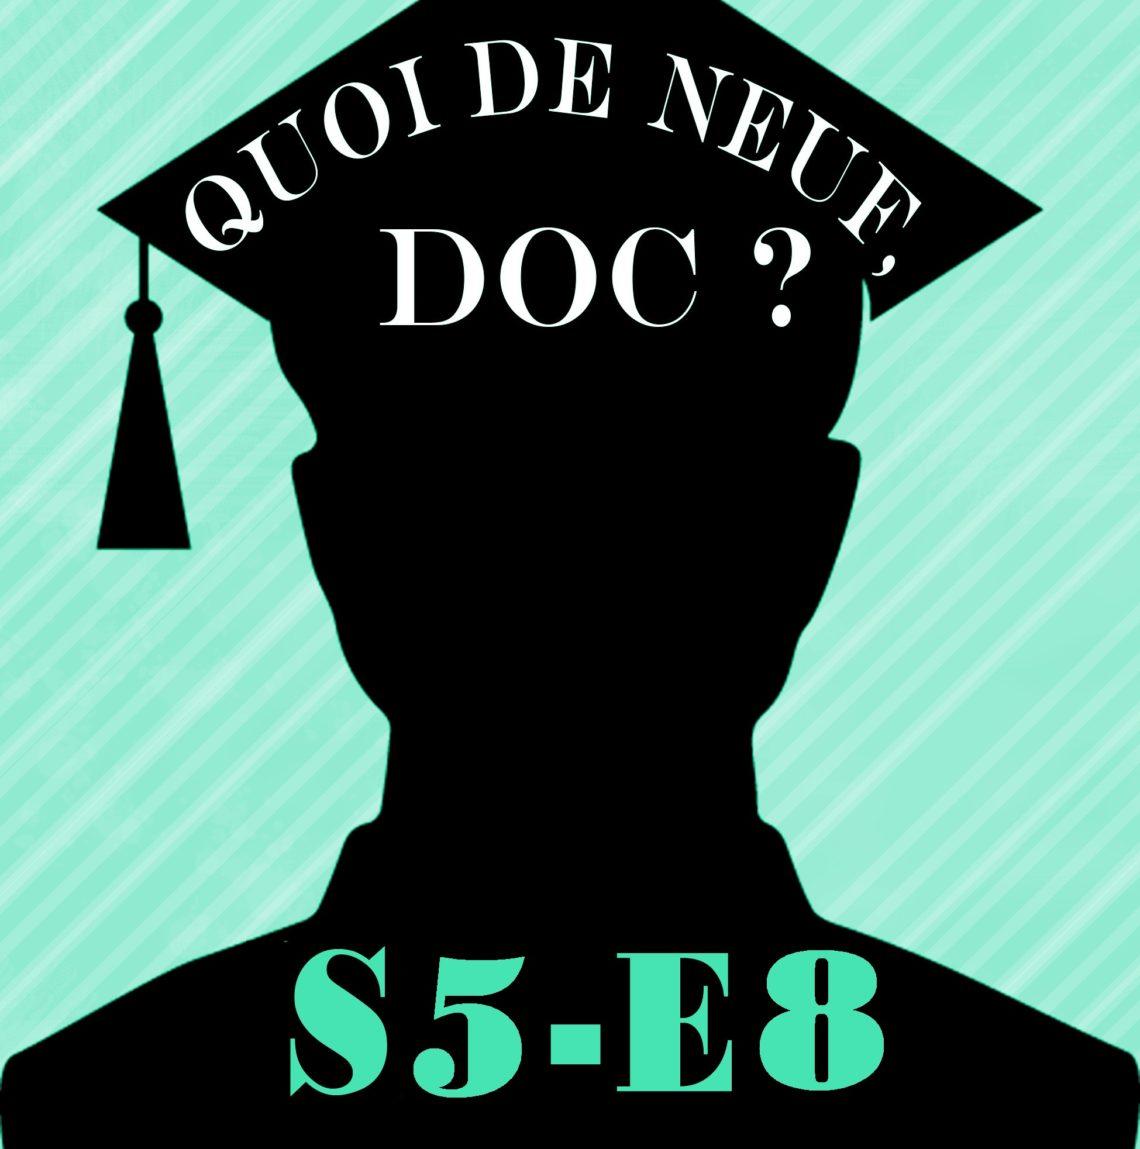 QDND S5E8 du mercredi 12 juin 2019